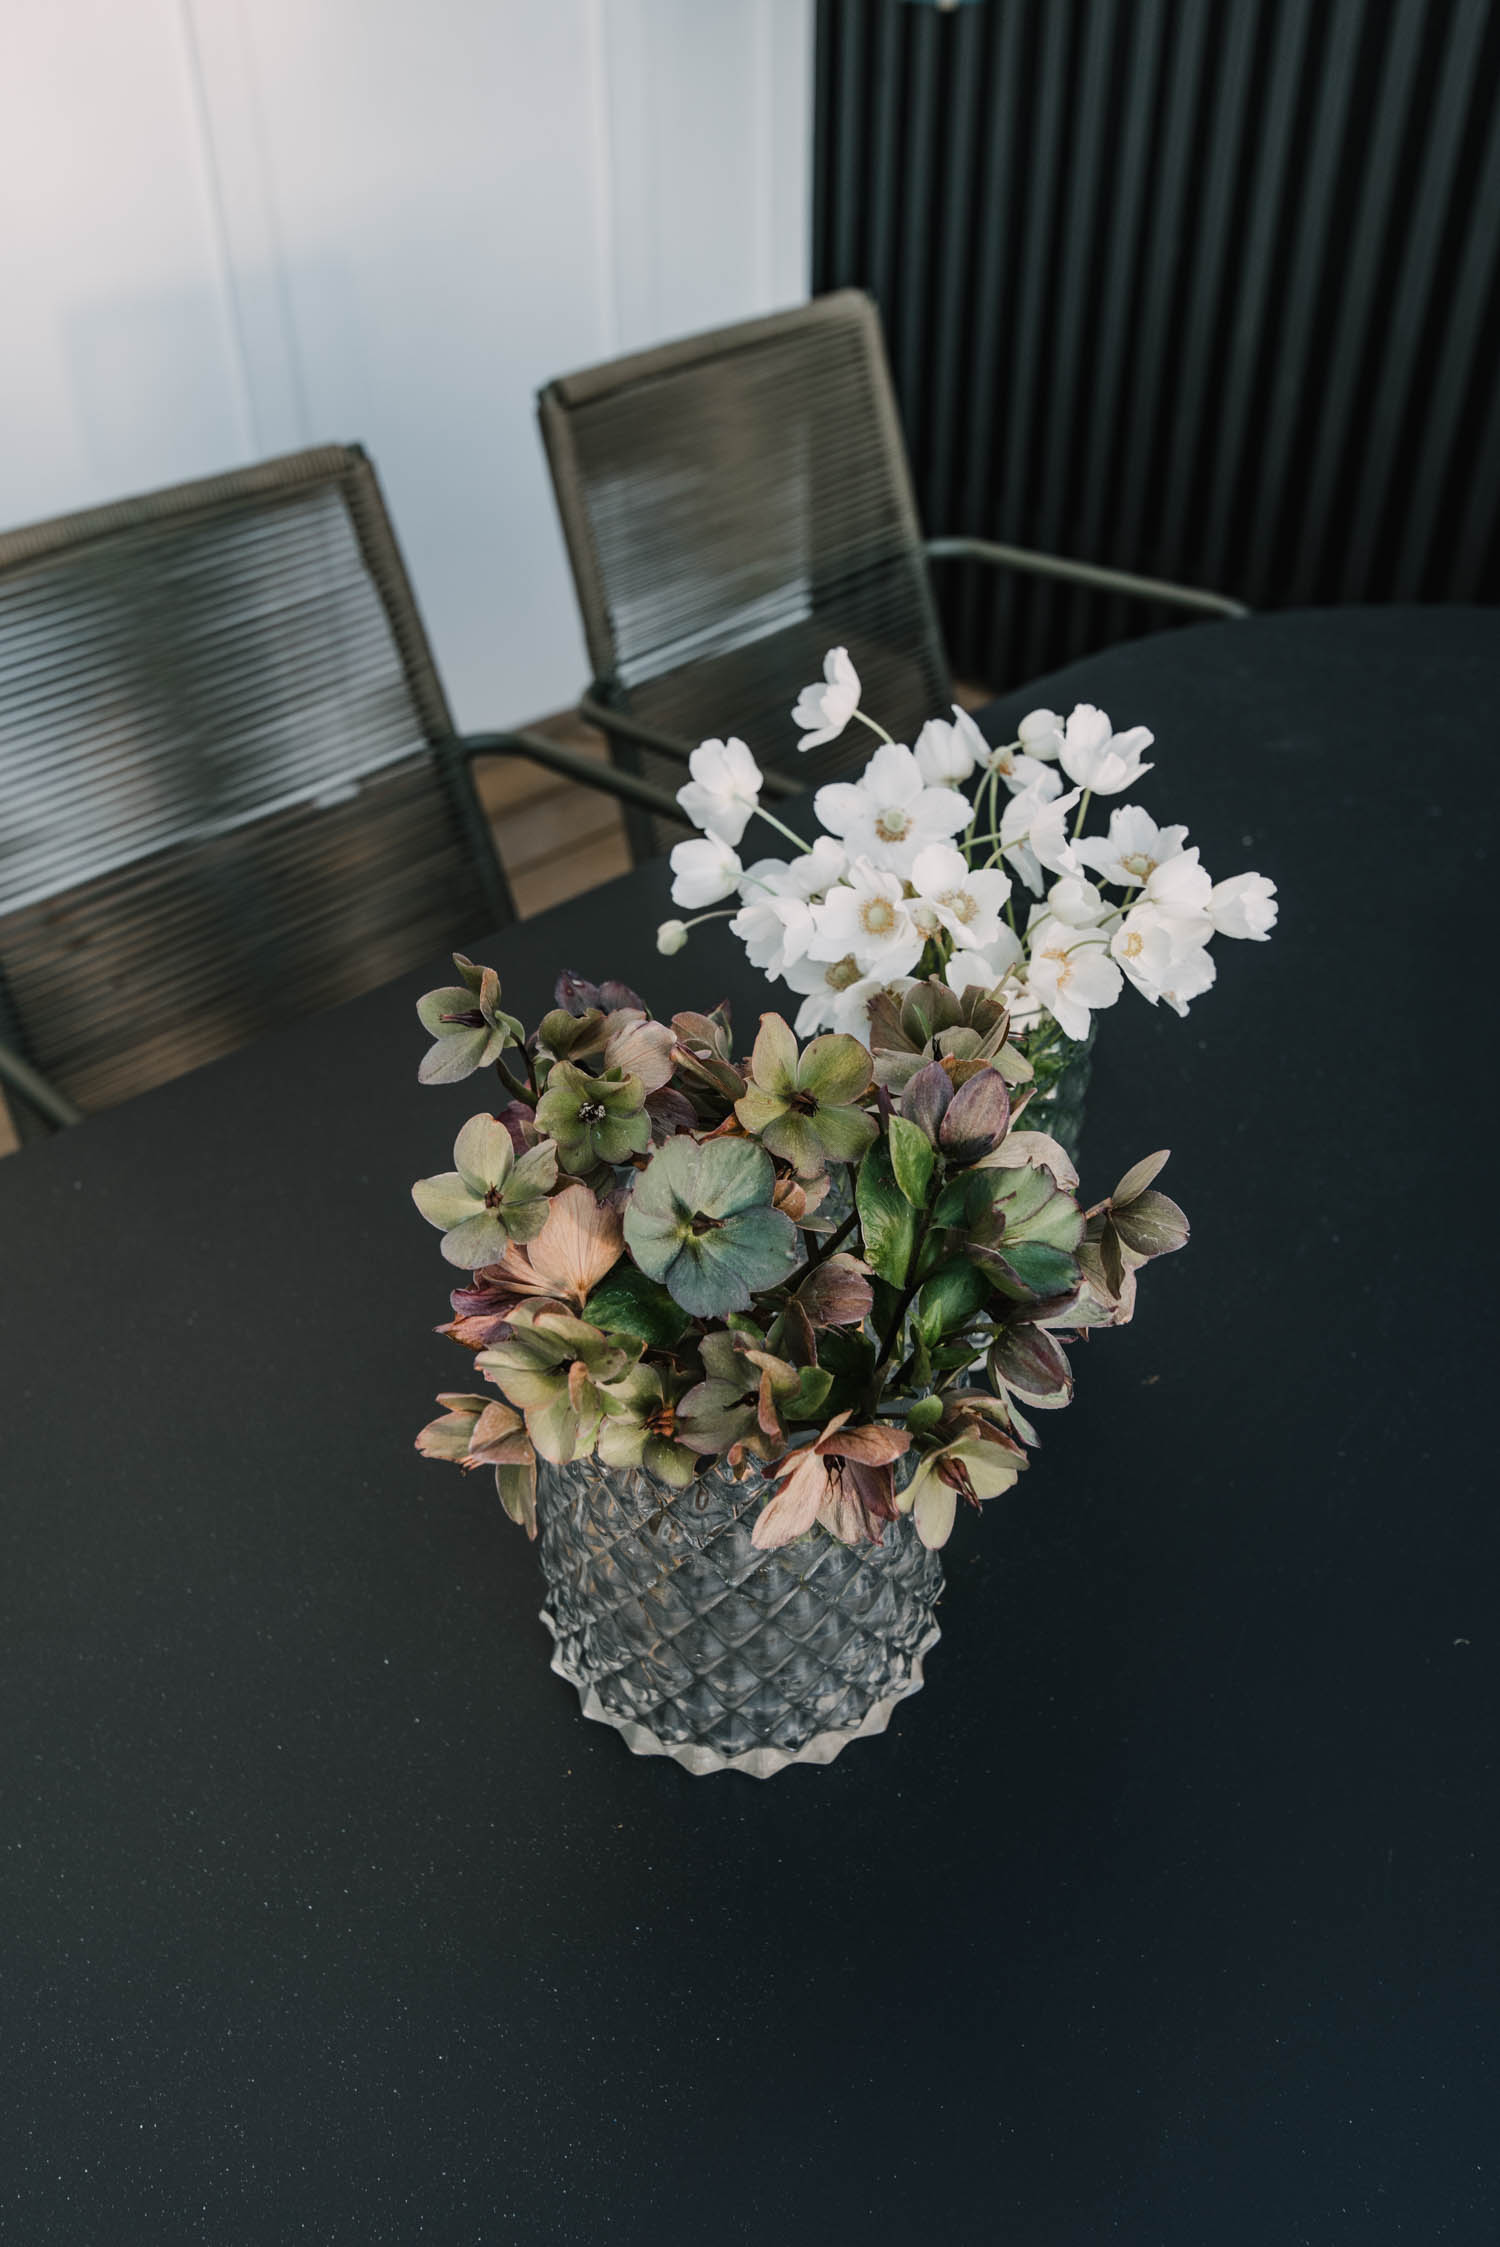 Hardy Perennial Cut Flowers for modern decor